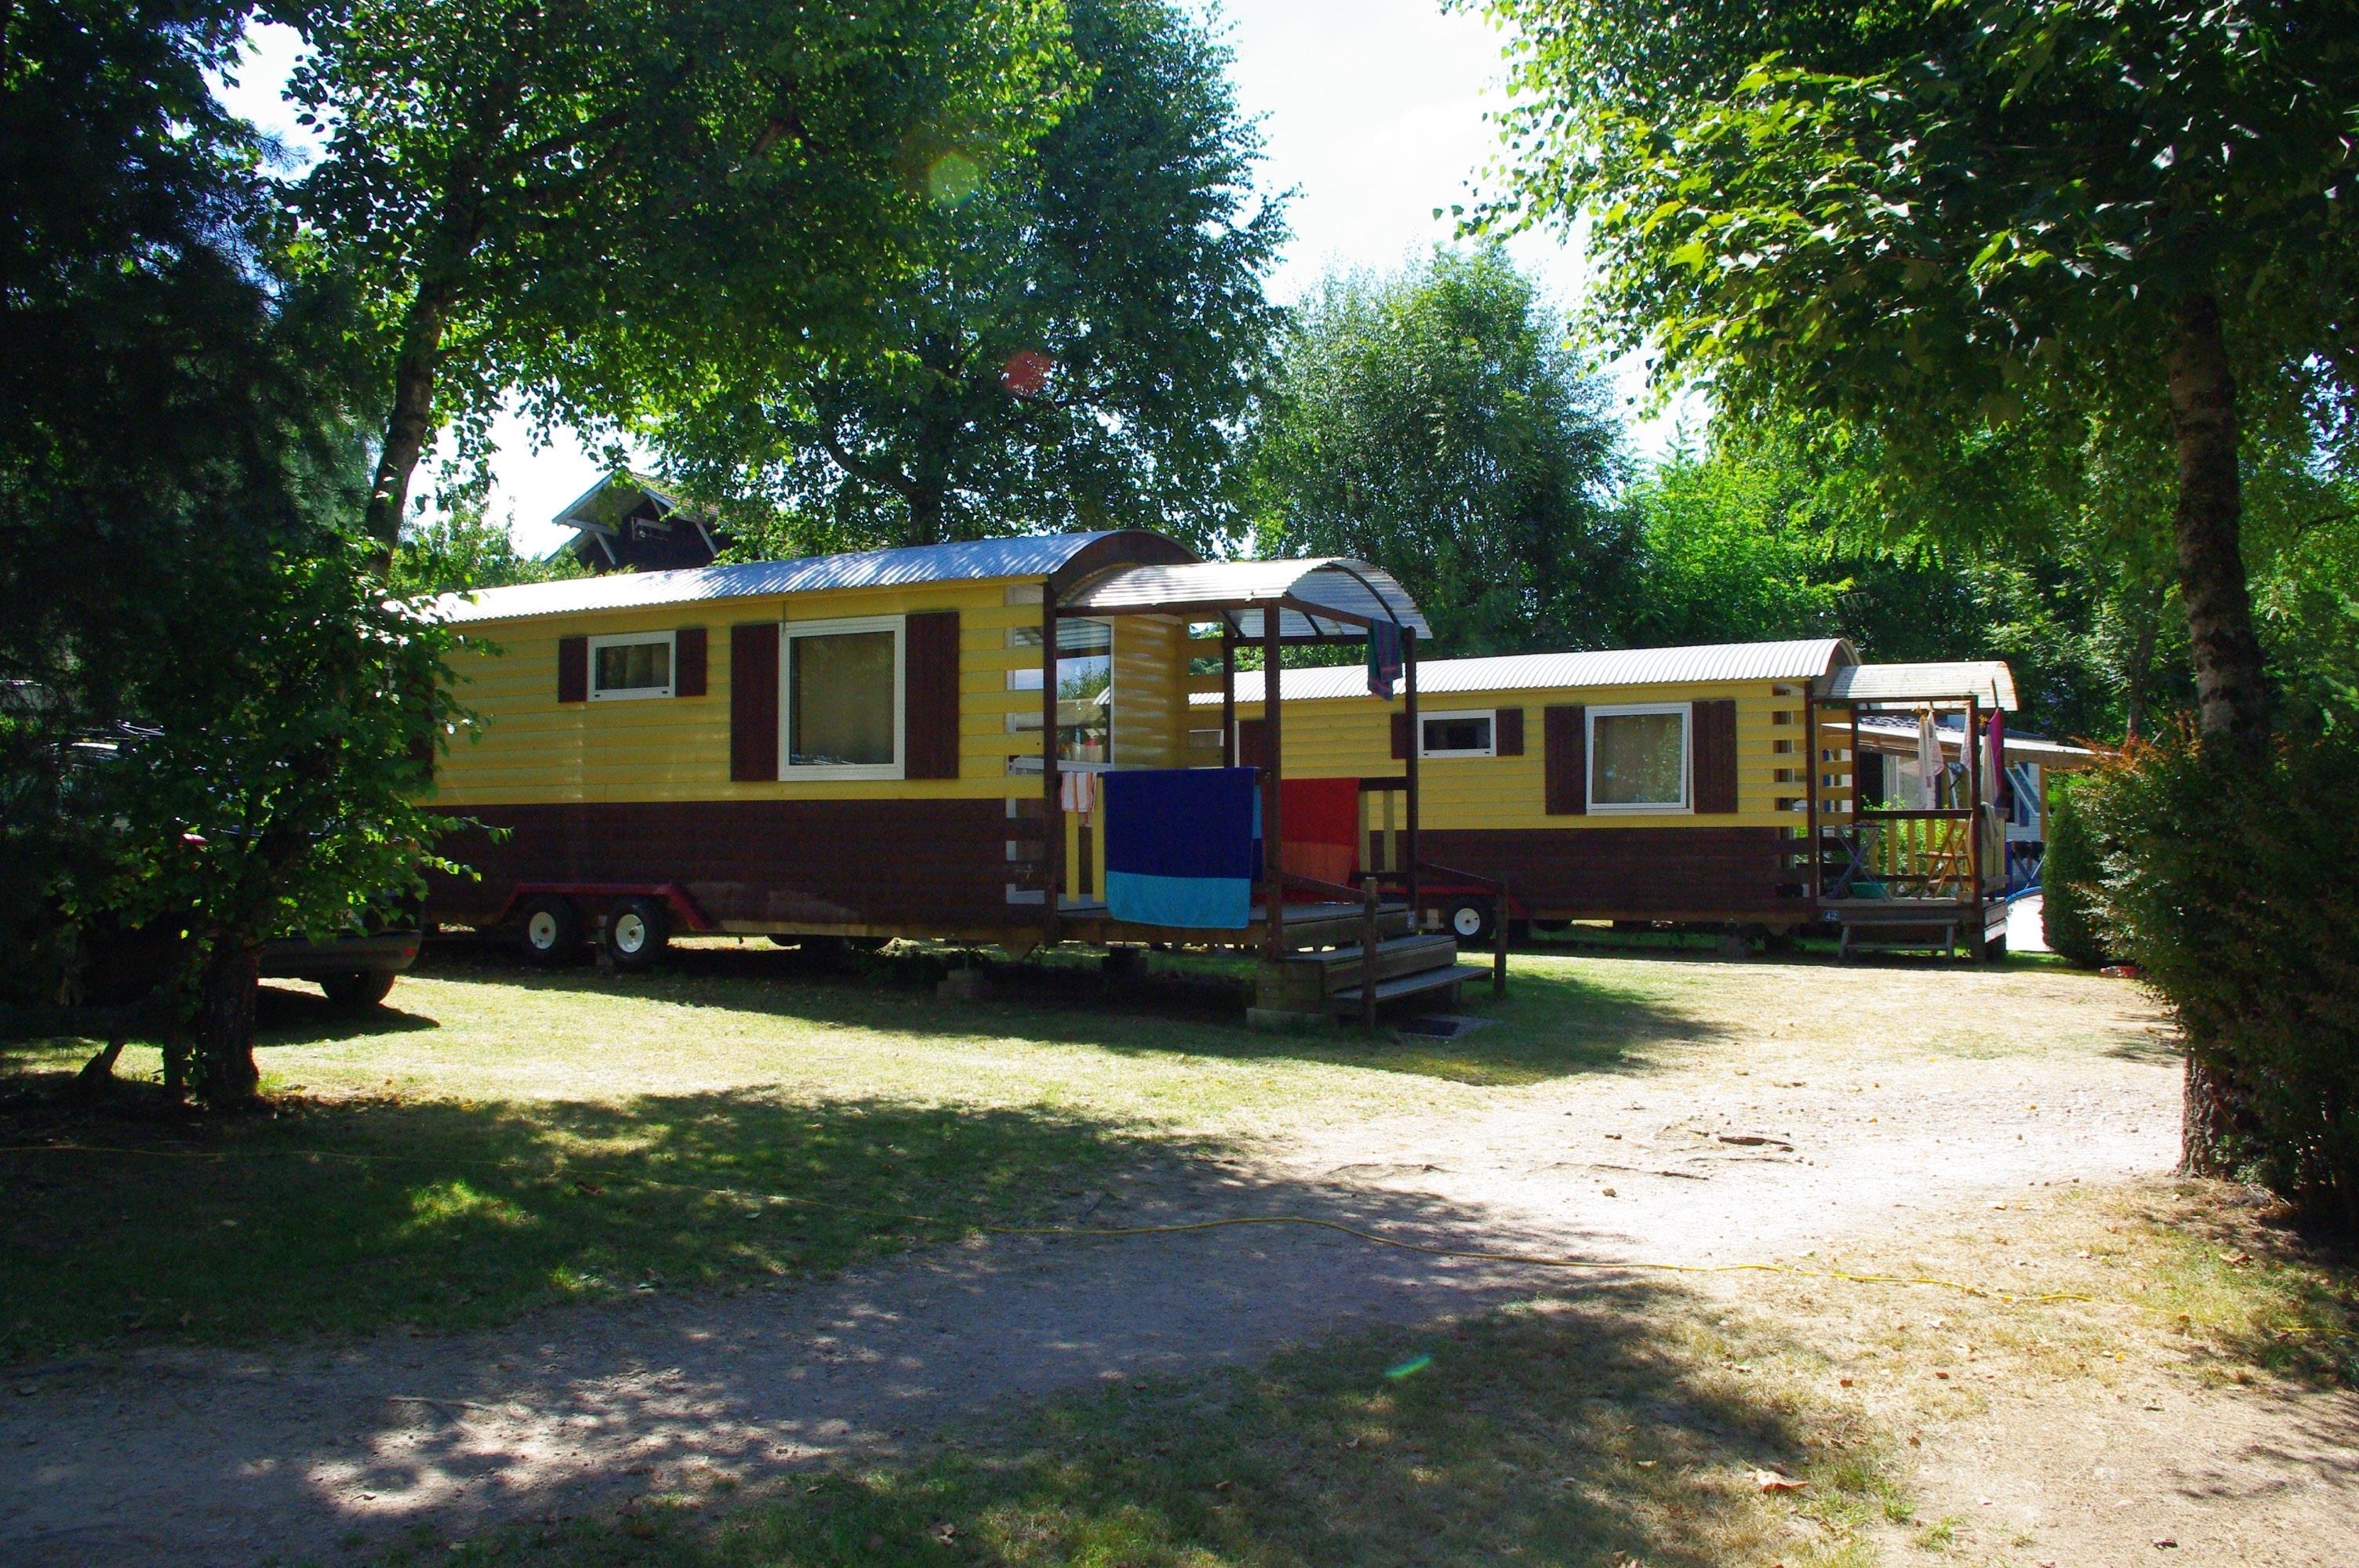 Camping les Deux Pins, Anould, Vosges